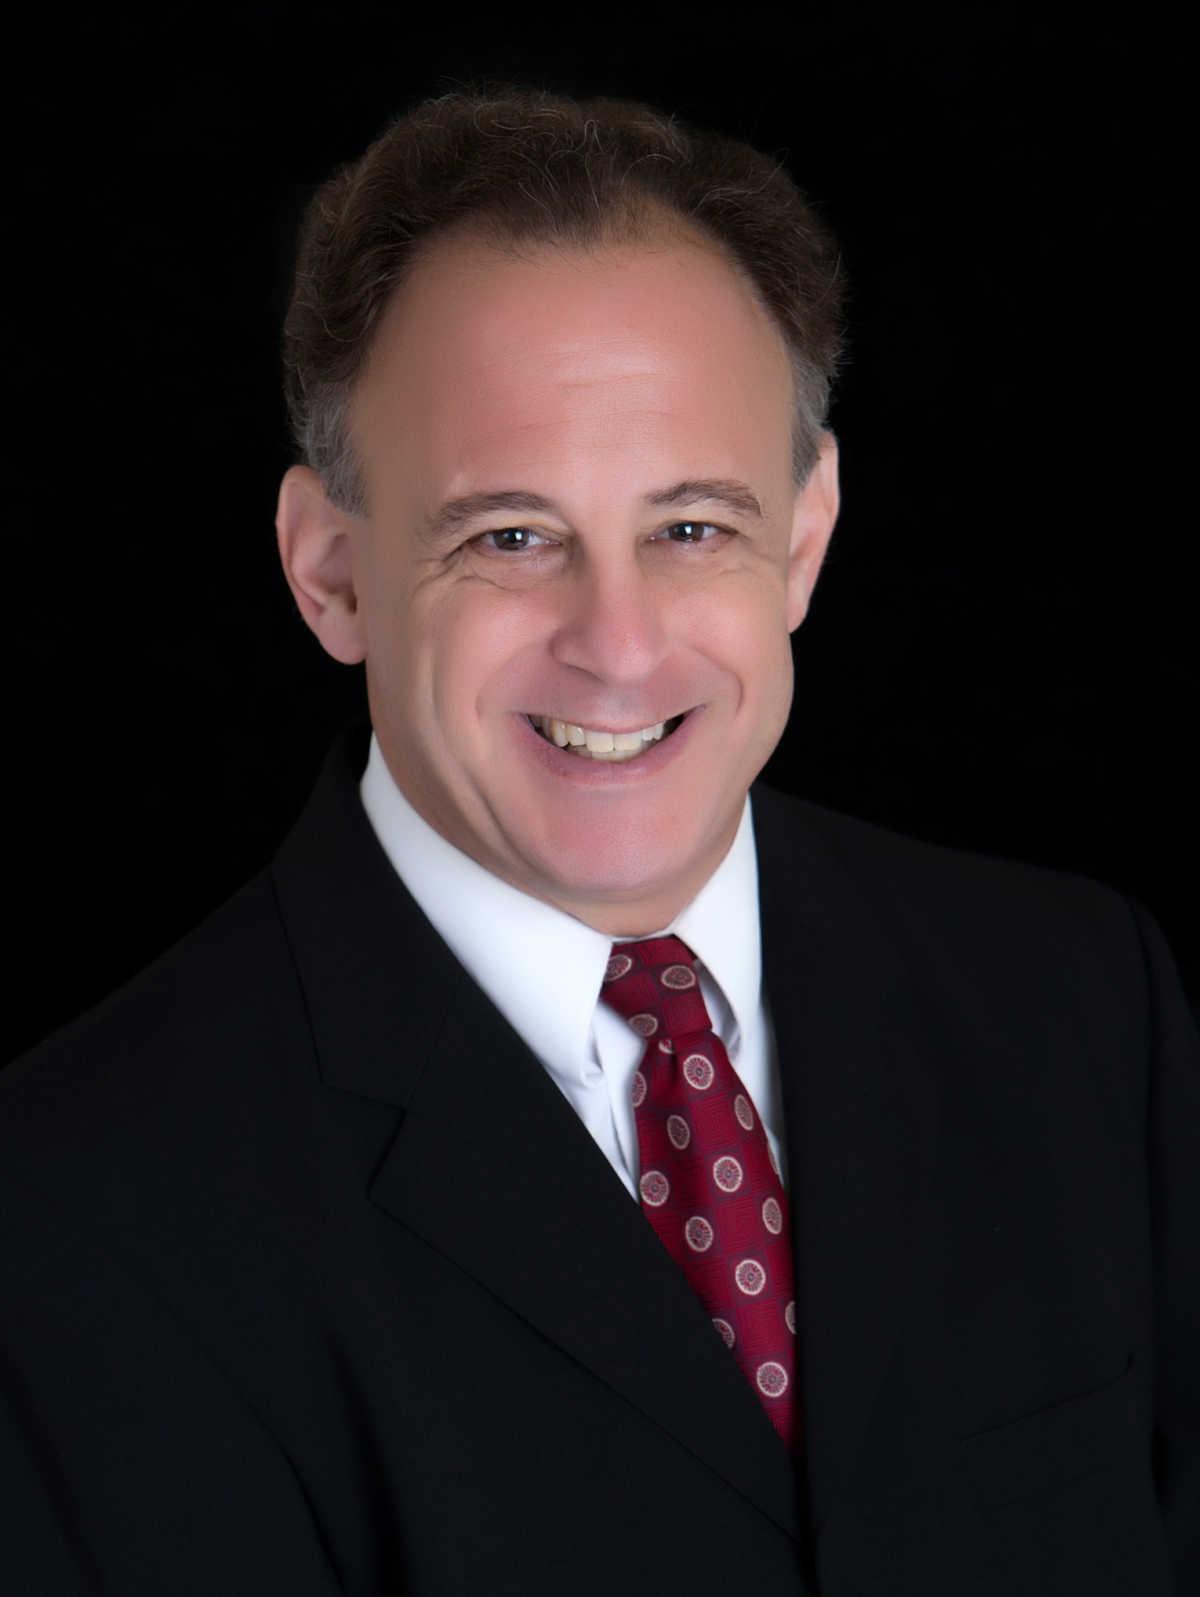 John Albion, President, Board of Directors, Uncommon Friends Foundation